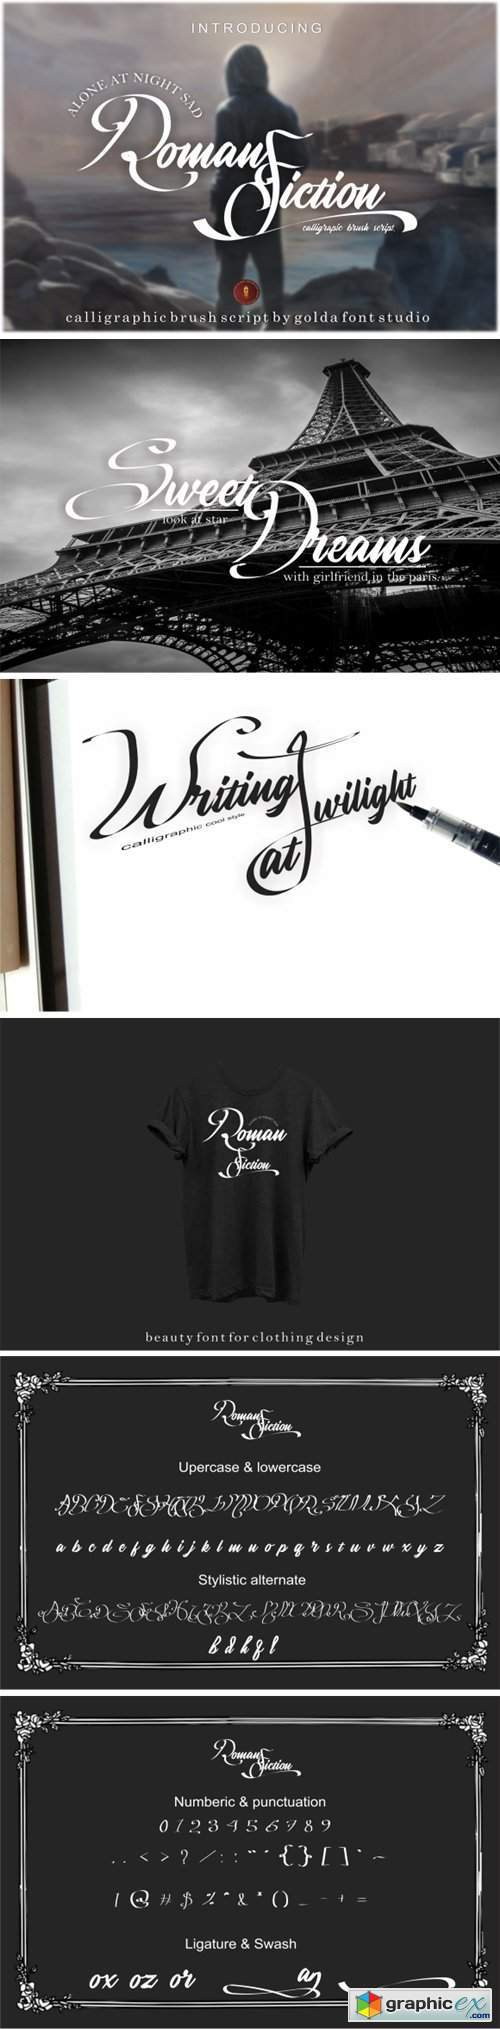 Roman Fiction Font